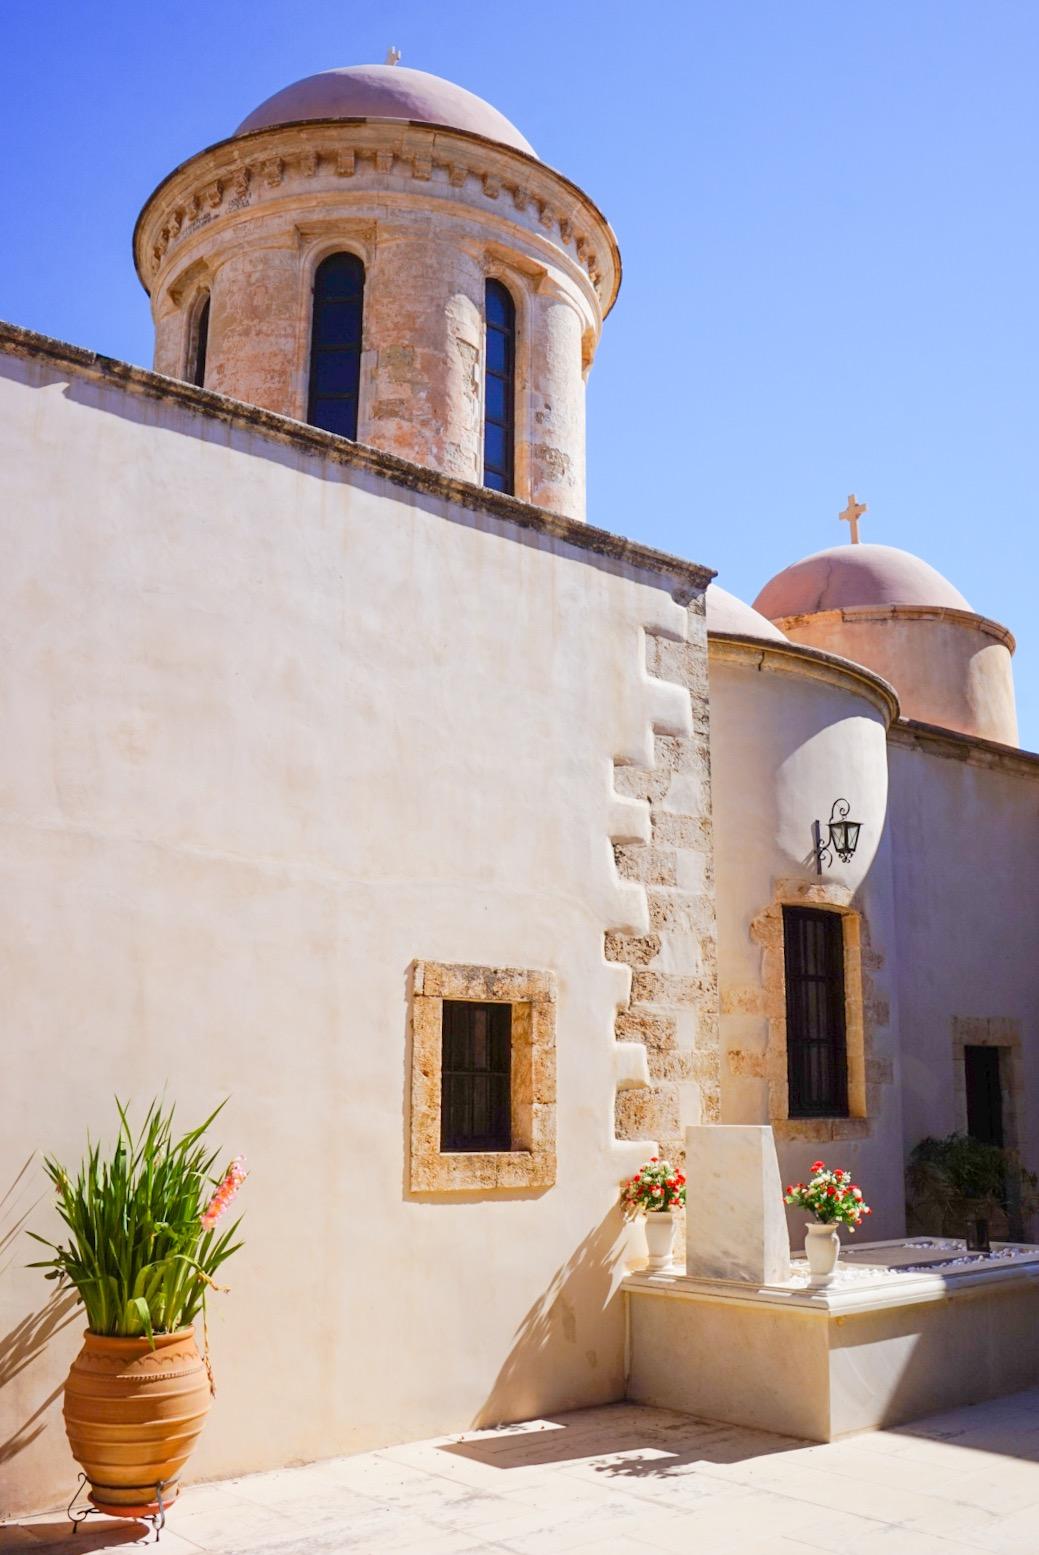 Gonian luostari, Kolymvari